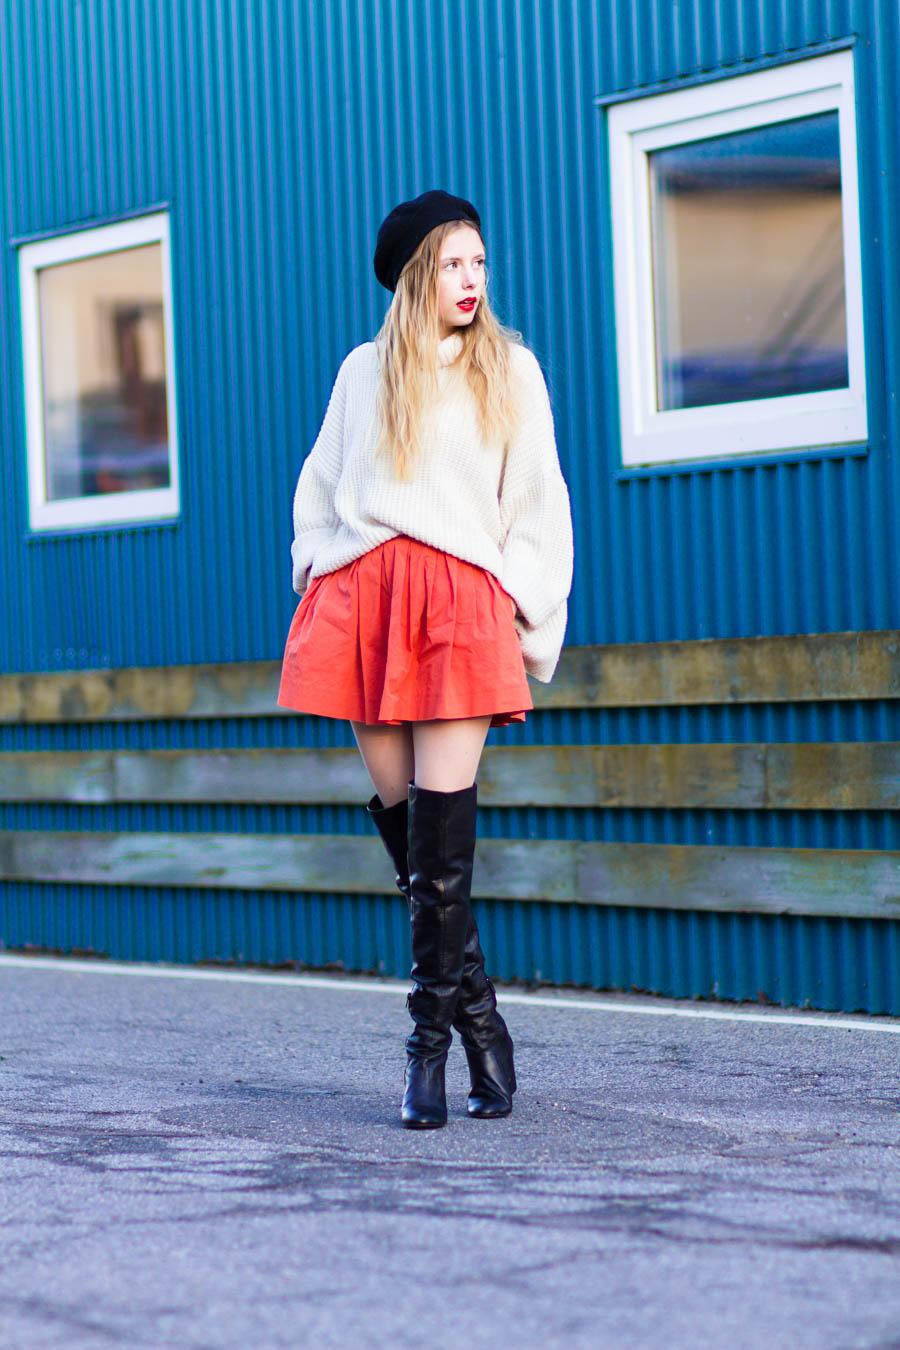 outfit december nemesis babe marie jensen danish blogger thigh high boots sarenza zara orange skirt vintage sweater and beret-3